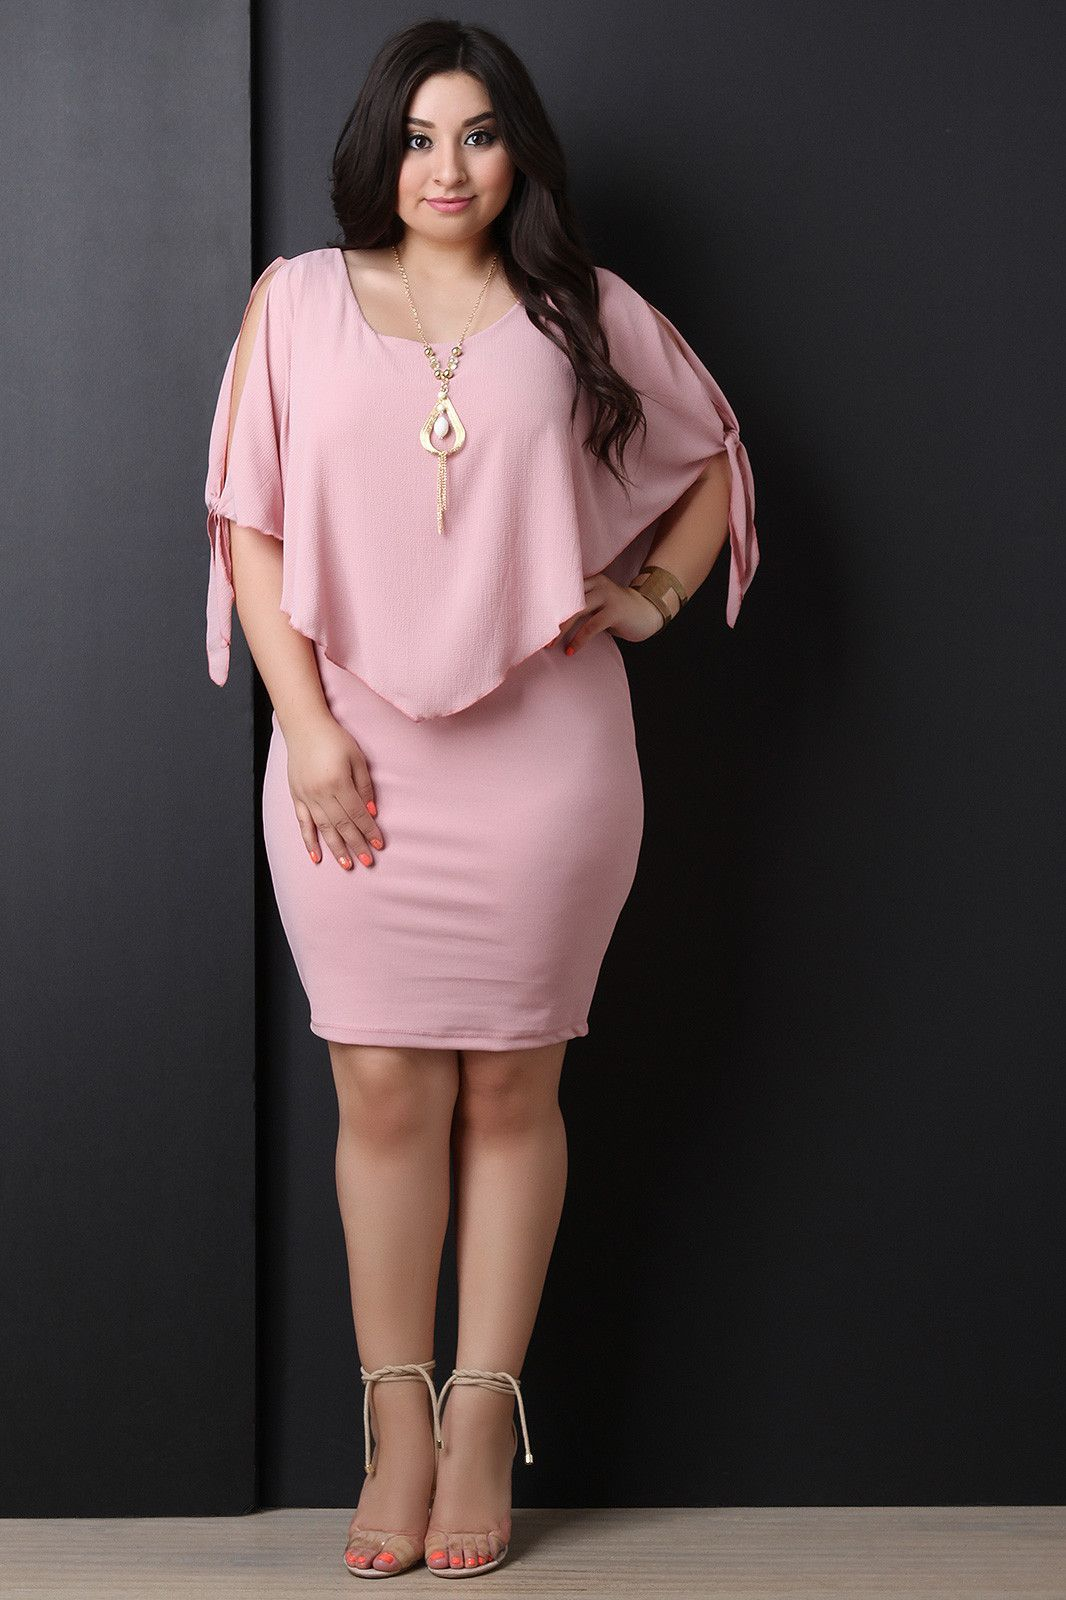 Poncho Self-Tie Sleeve Necklace Midi Dress | My Style | Pinterest ...